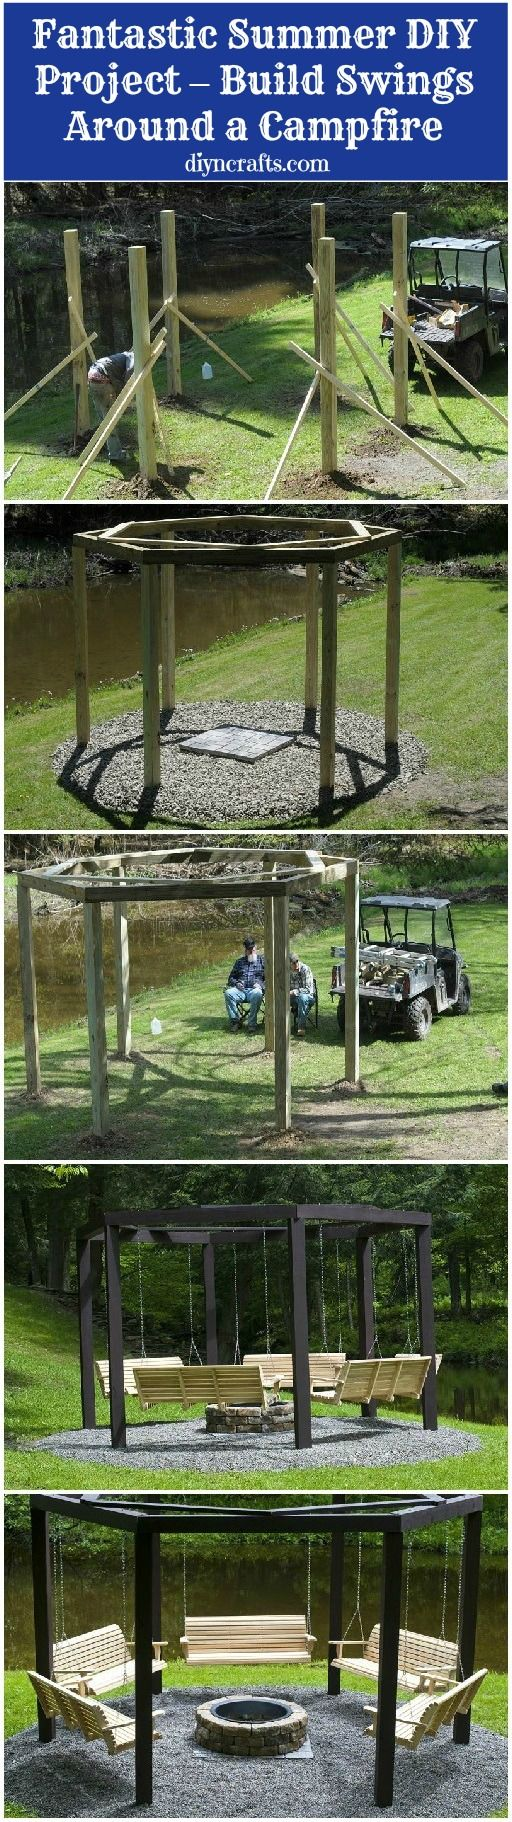 Fantastic Summer DIY Project � Build Swings Around a Campfire